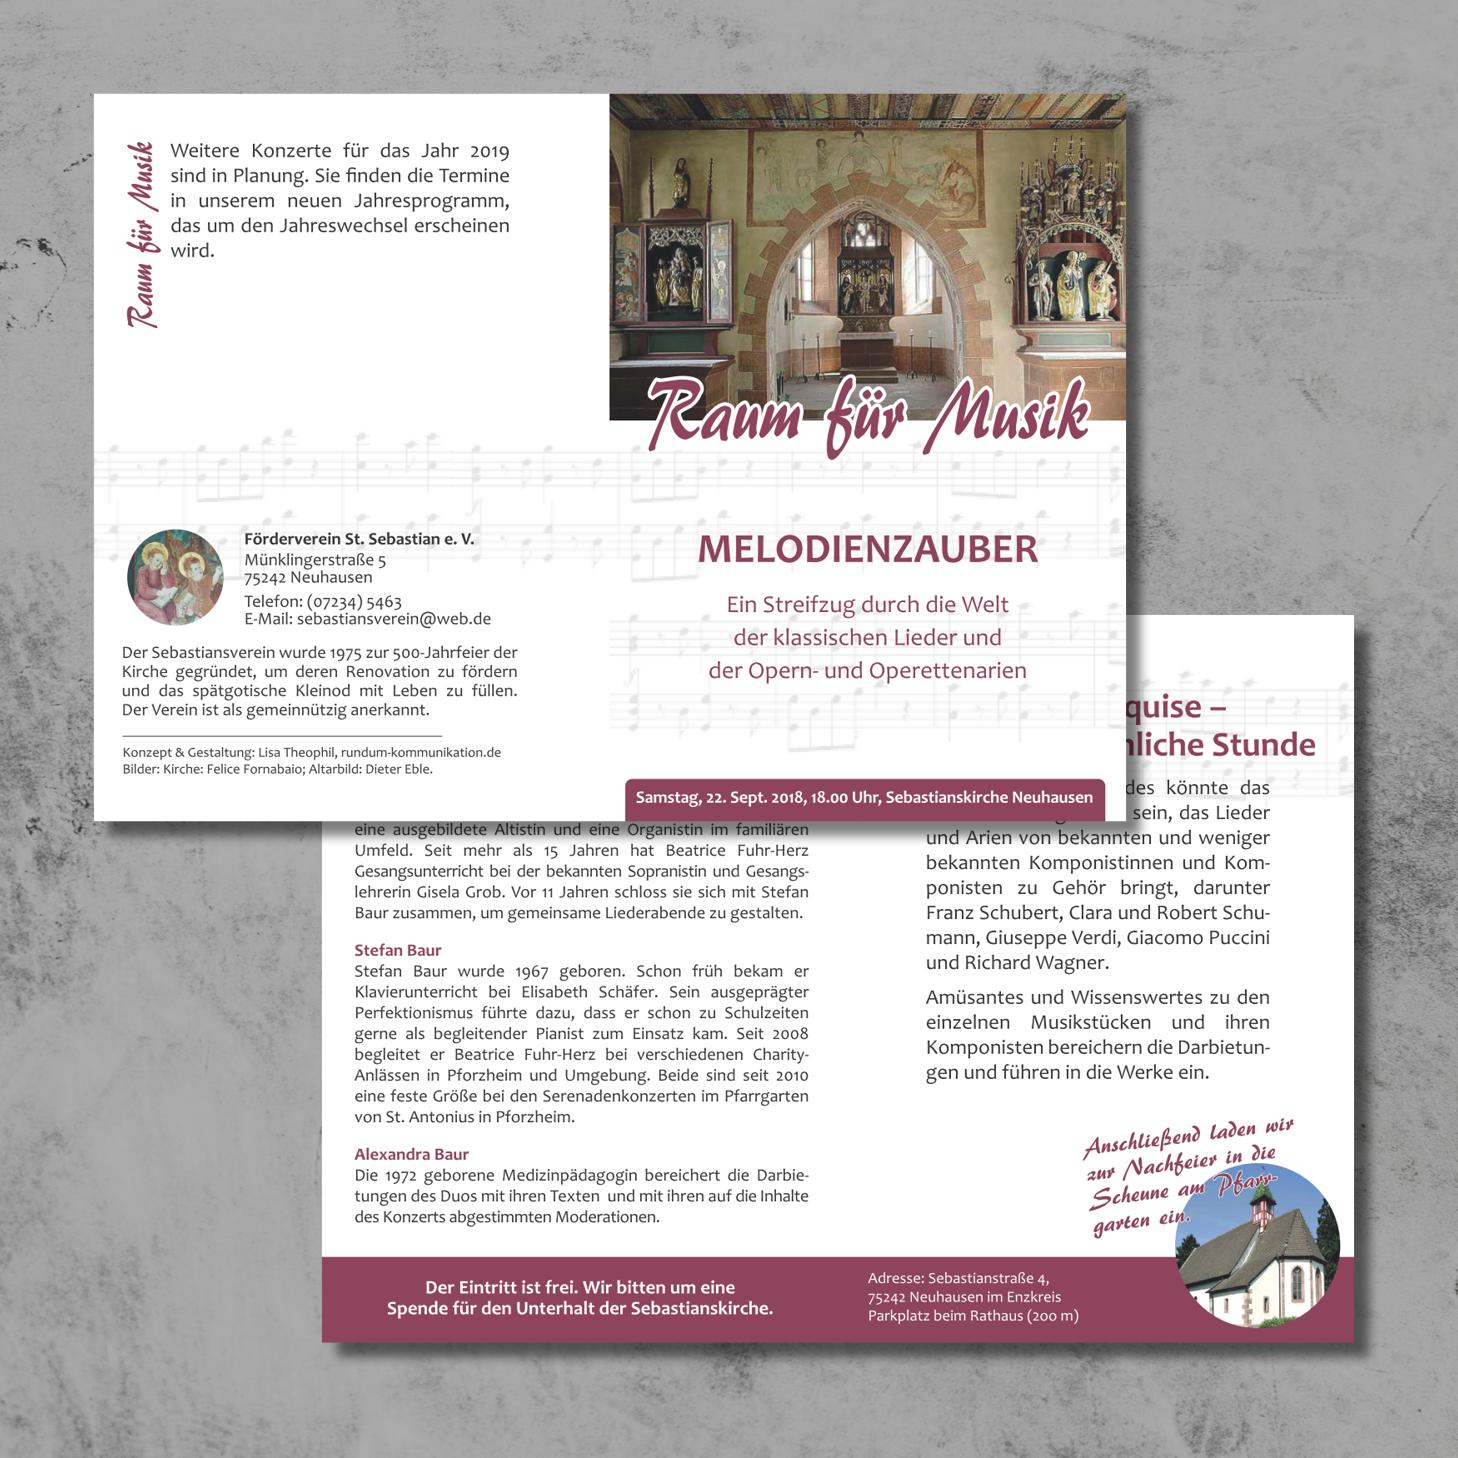 Programmflyer für den Förderverein Sebastianskirche e. V.